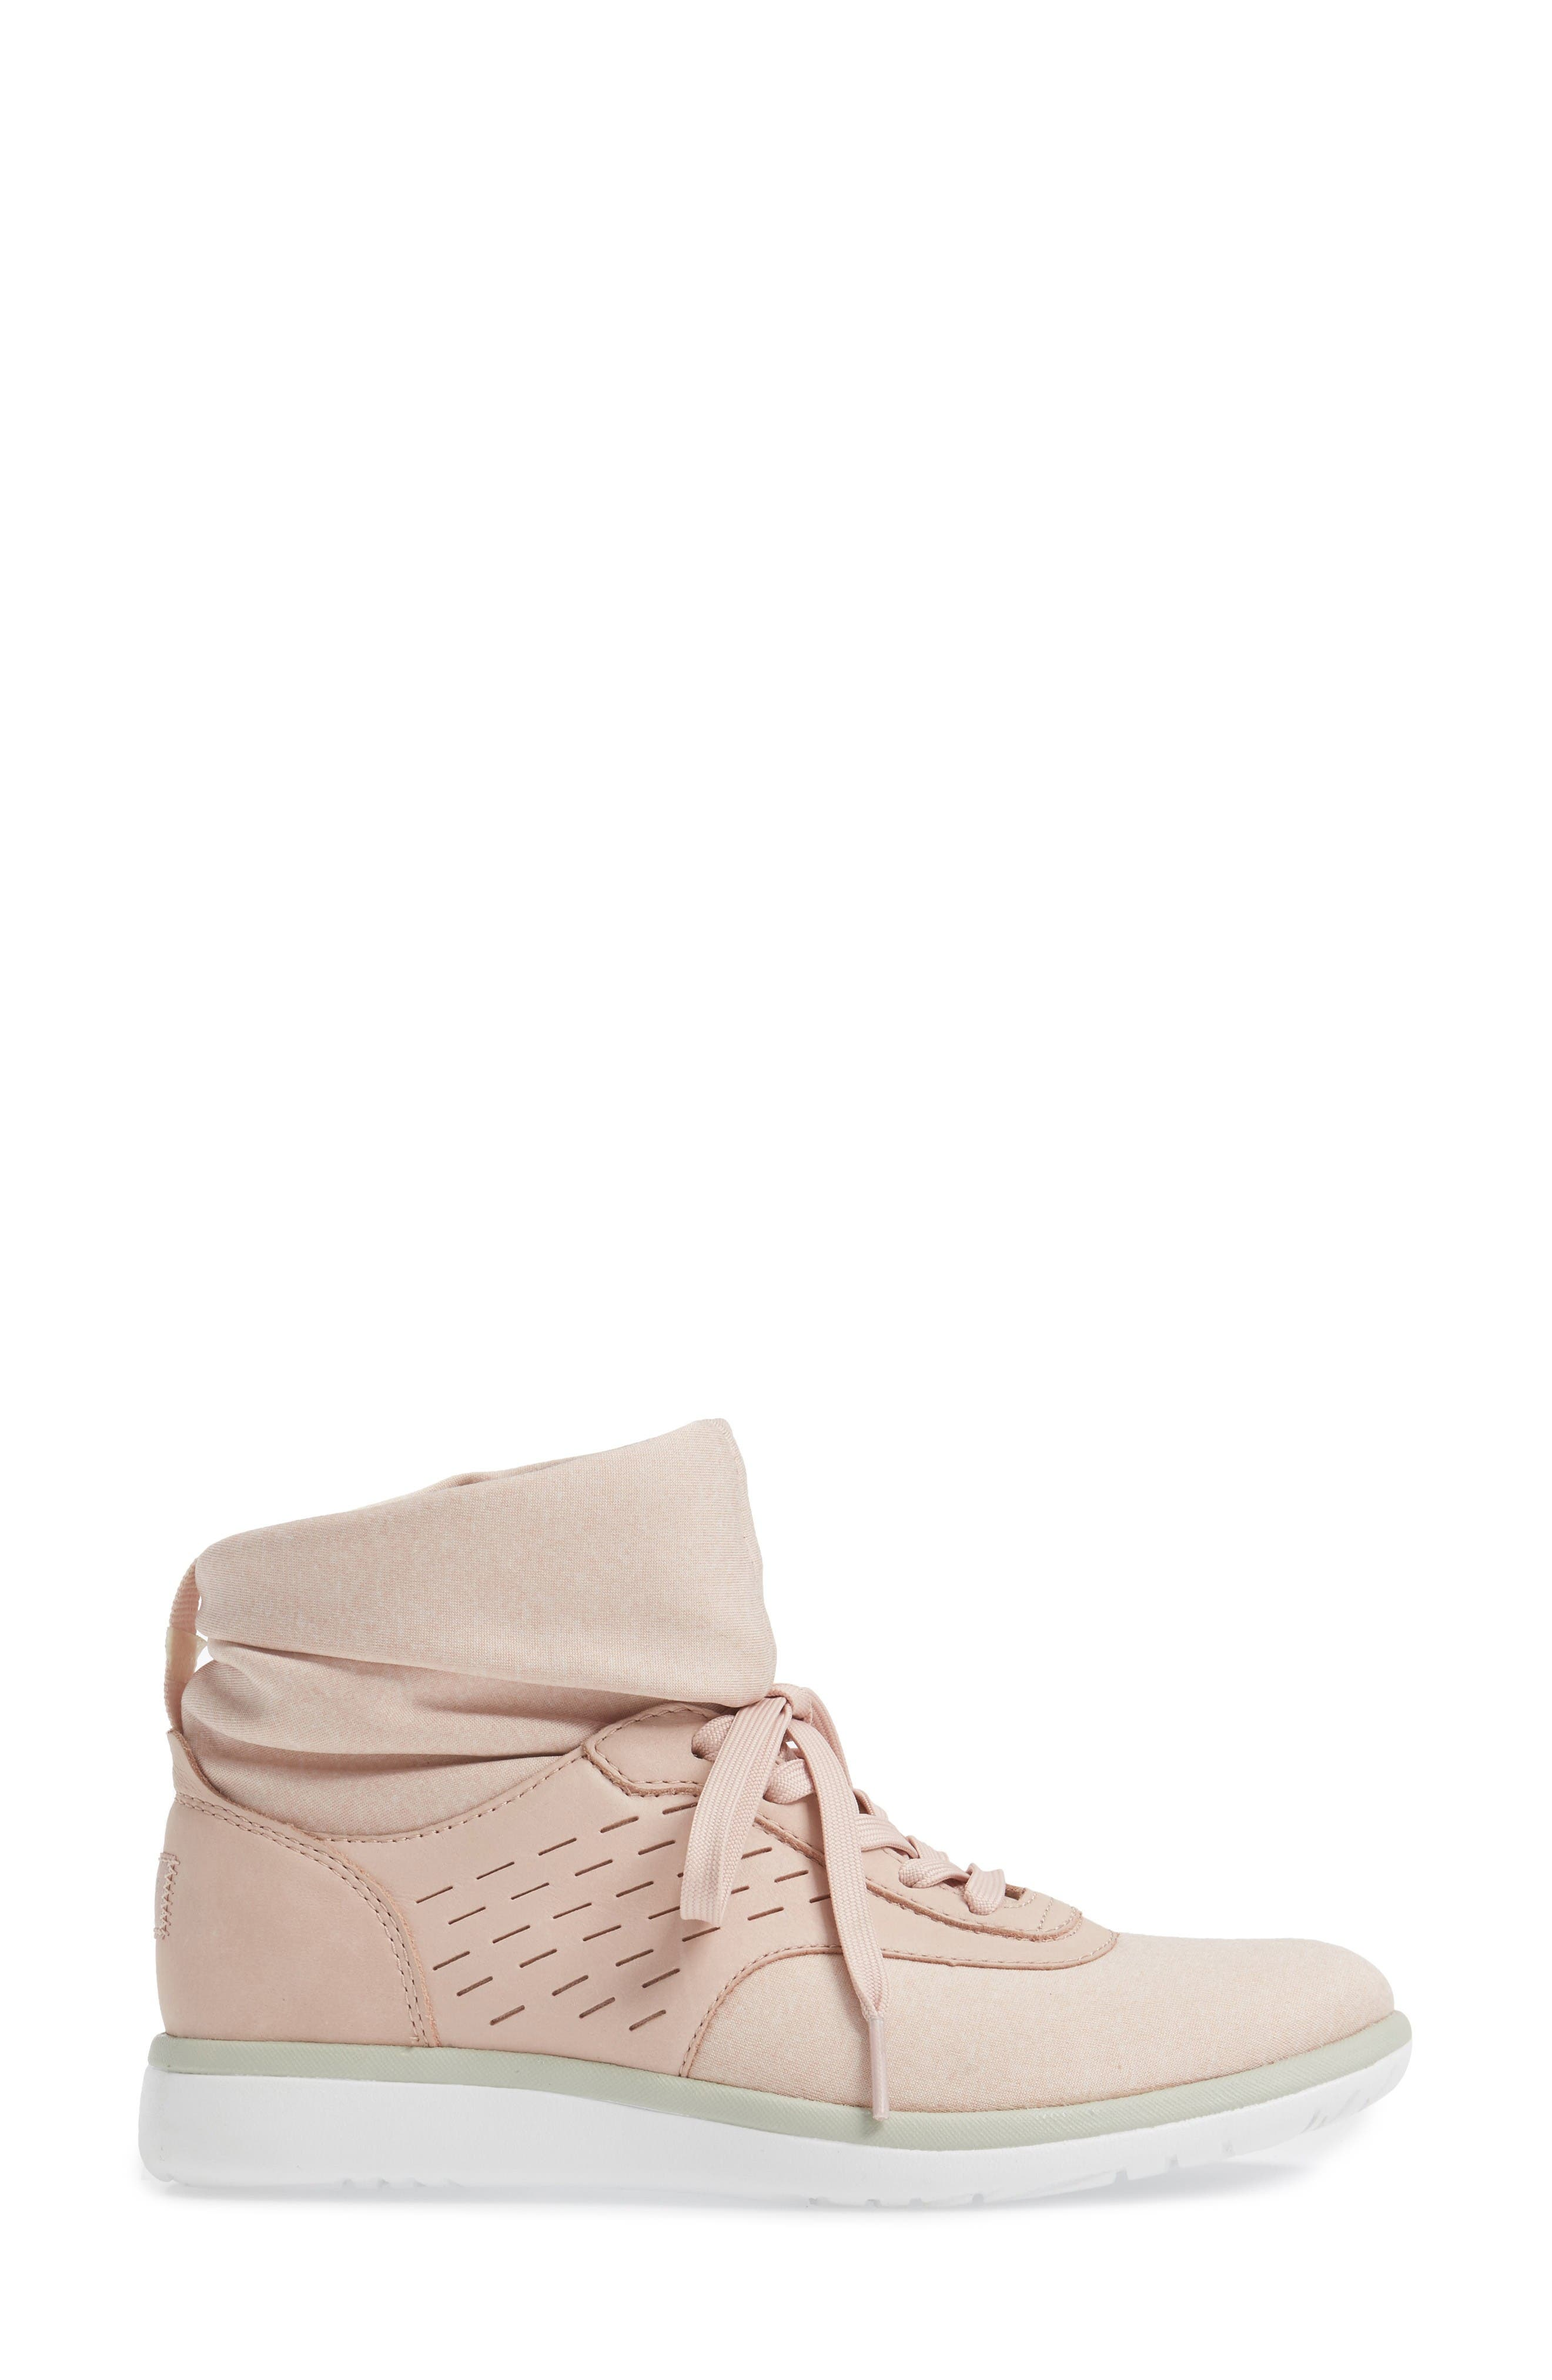 Alternate Image 3  - UGG® Islay High Top Sneaker (Women)